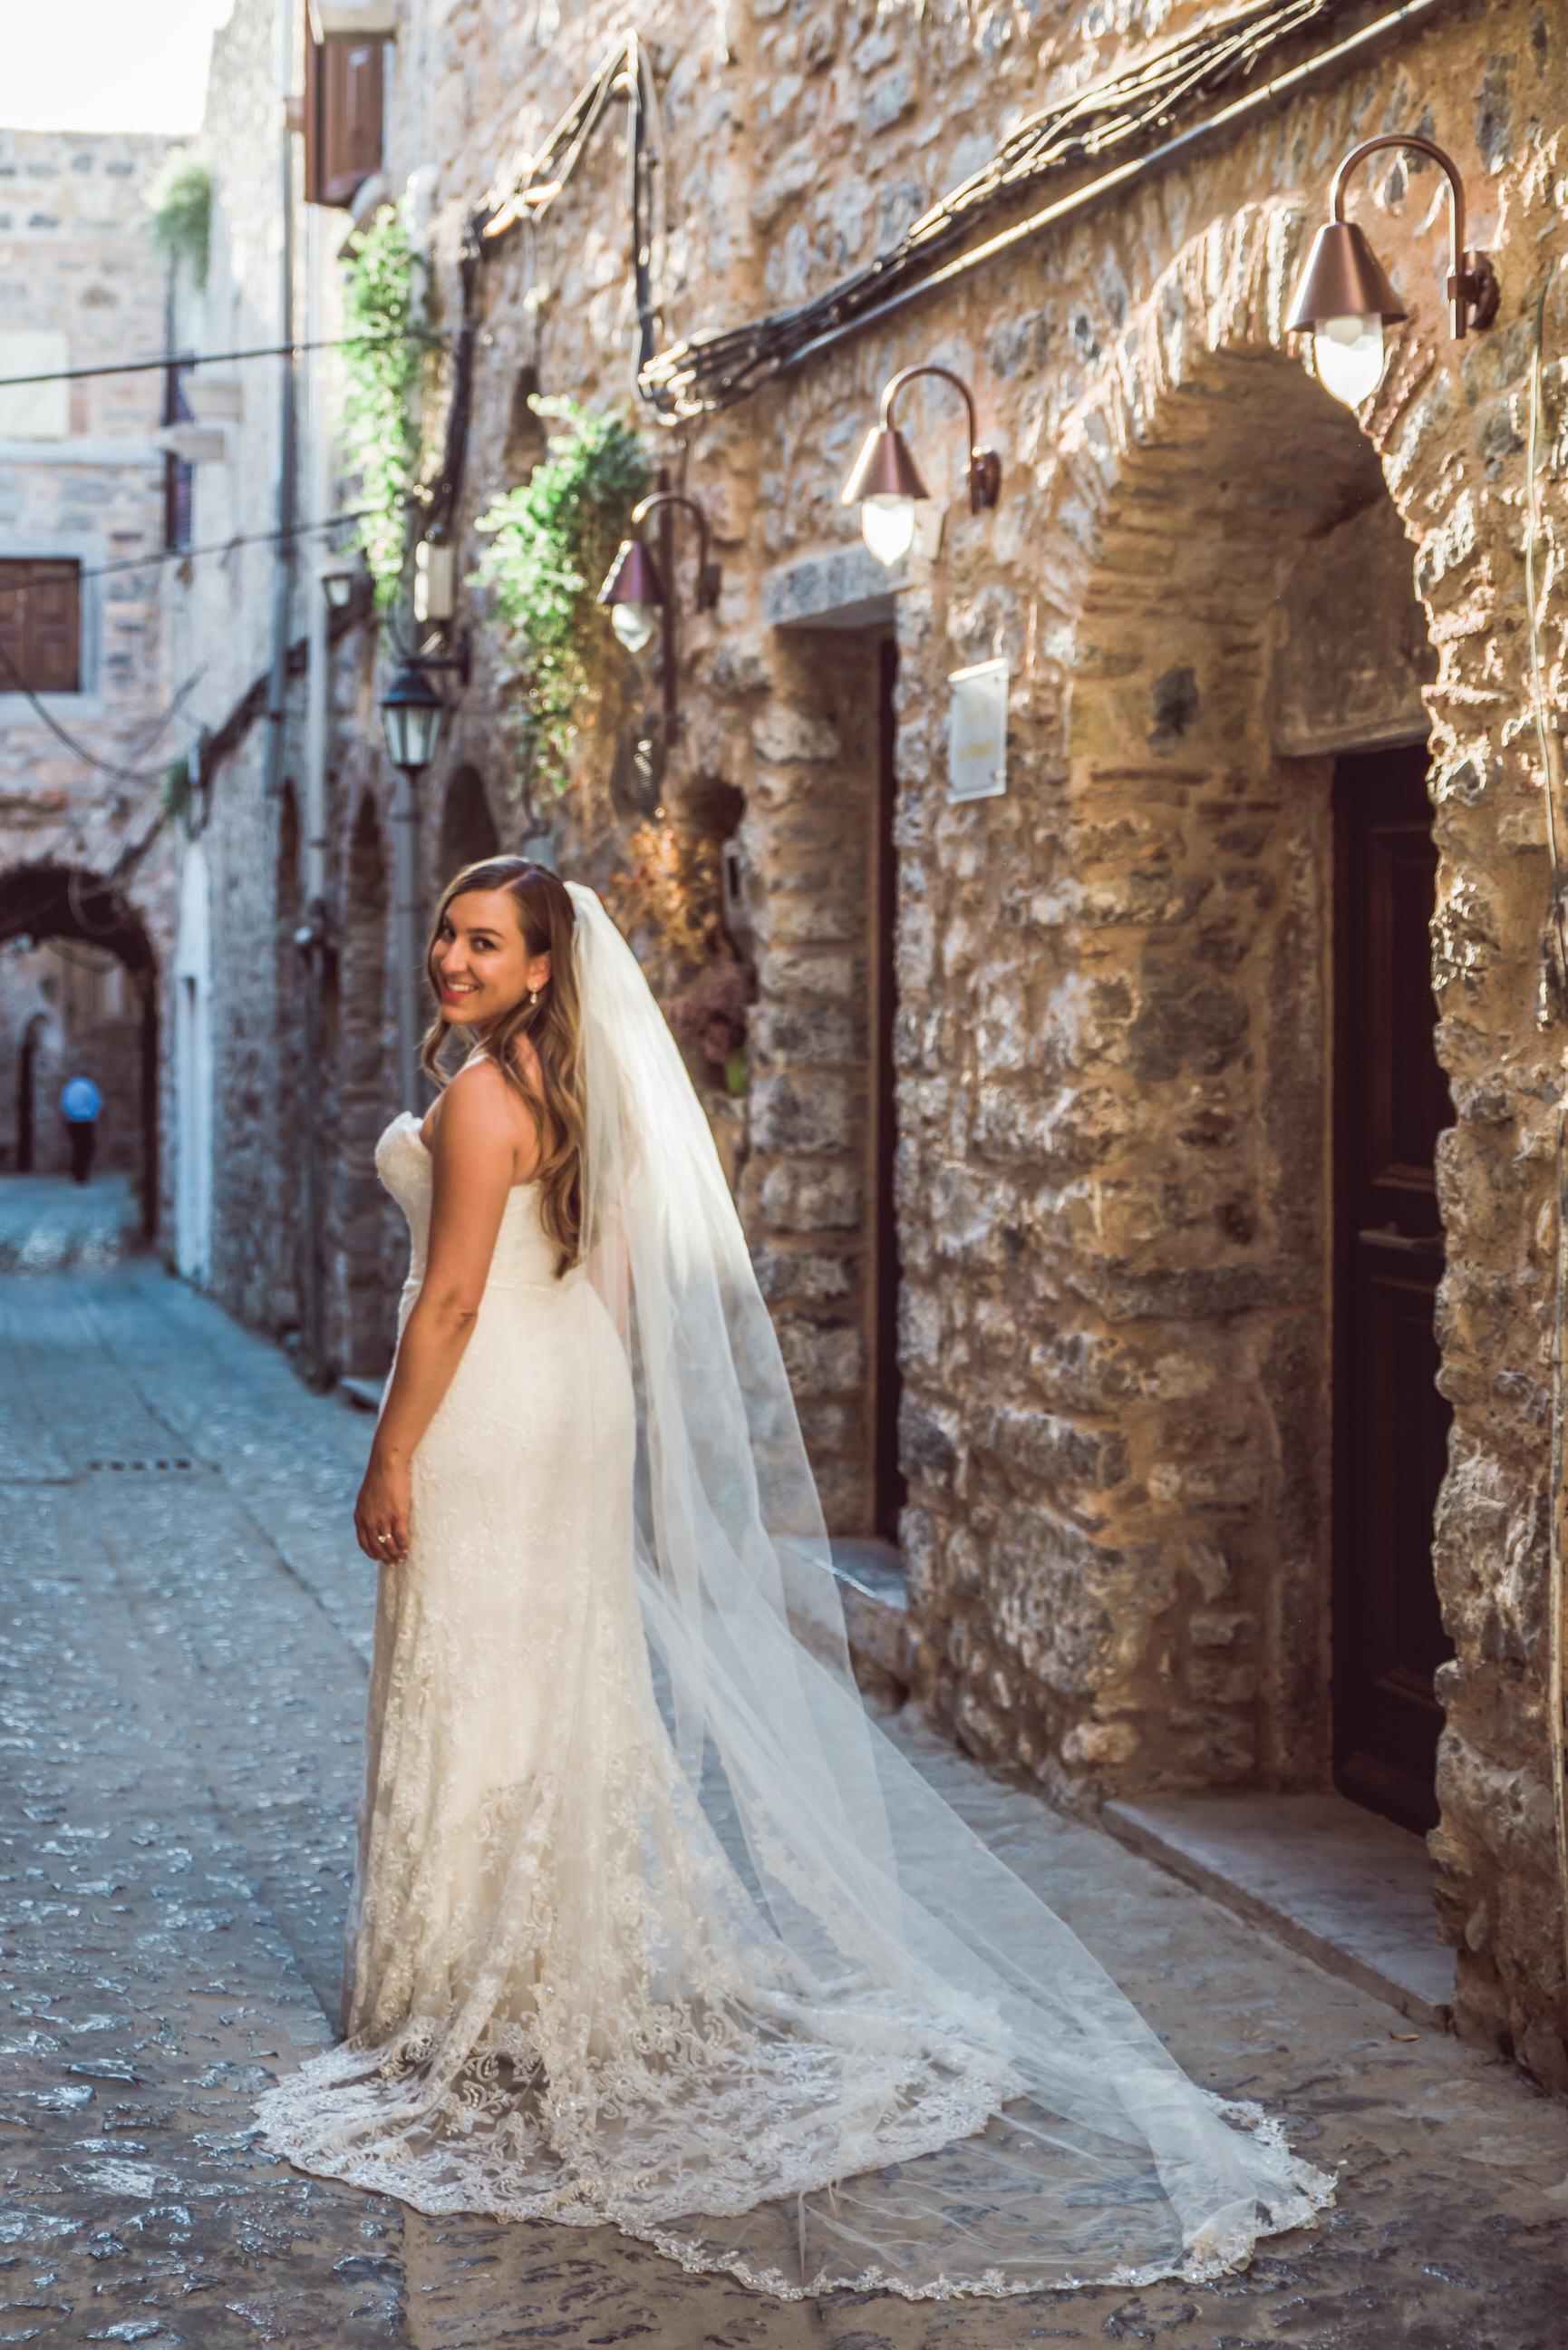 GreeceWedding-Tricia&Will-DayAfter-160.jpg